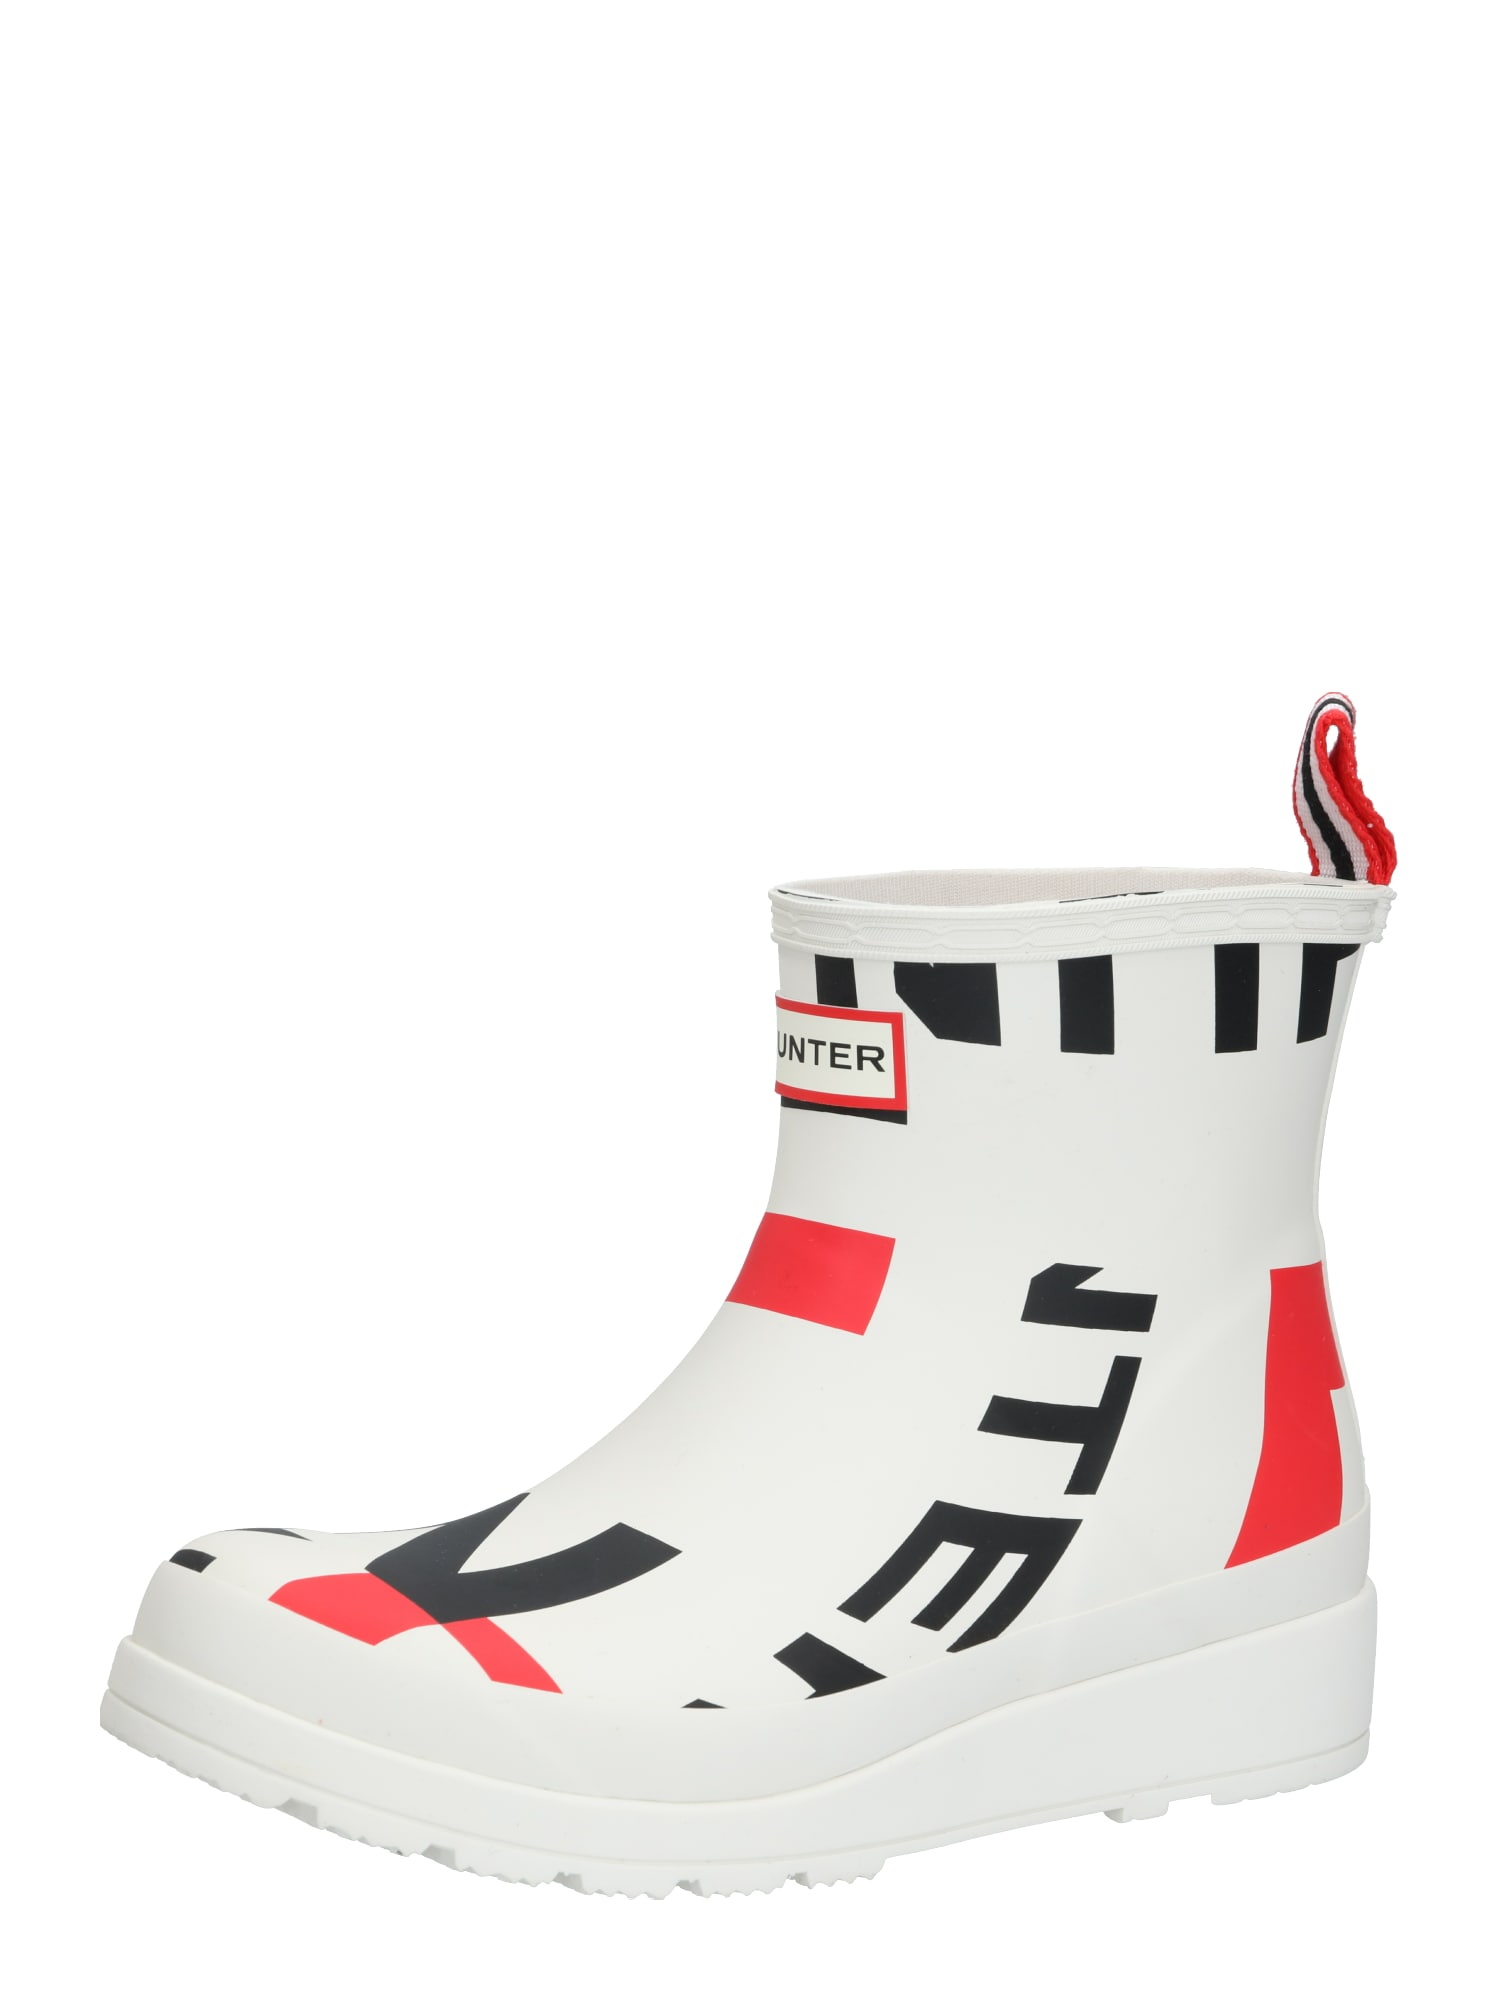 HUNTER Guminiai batai raudona / balta / mėlyna